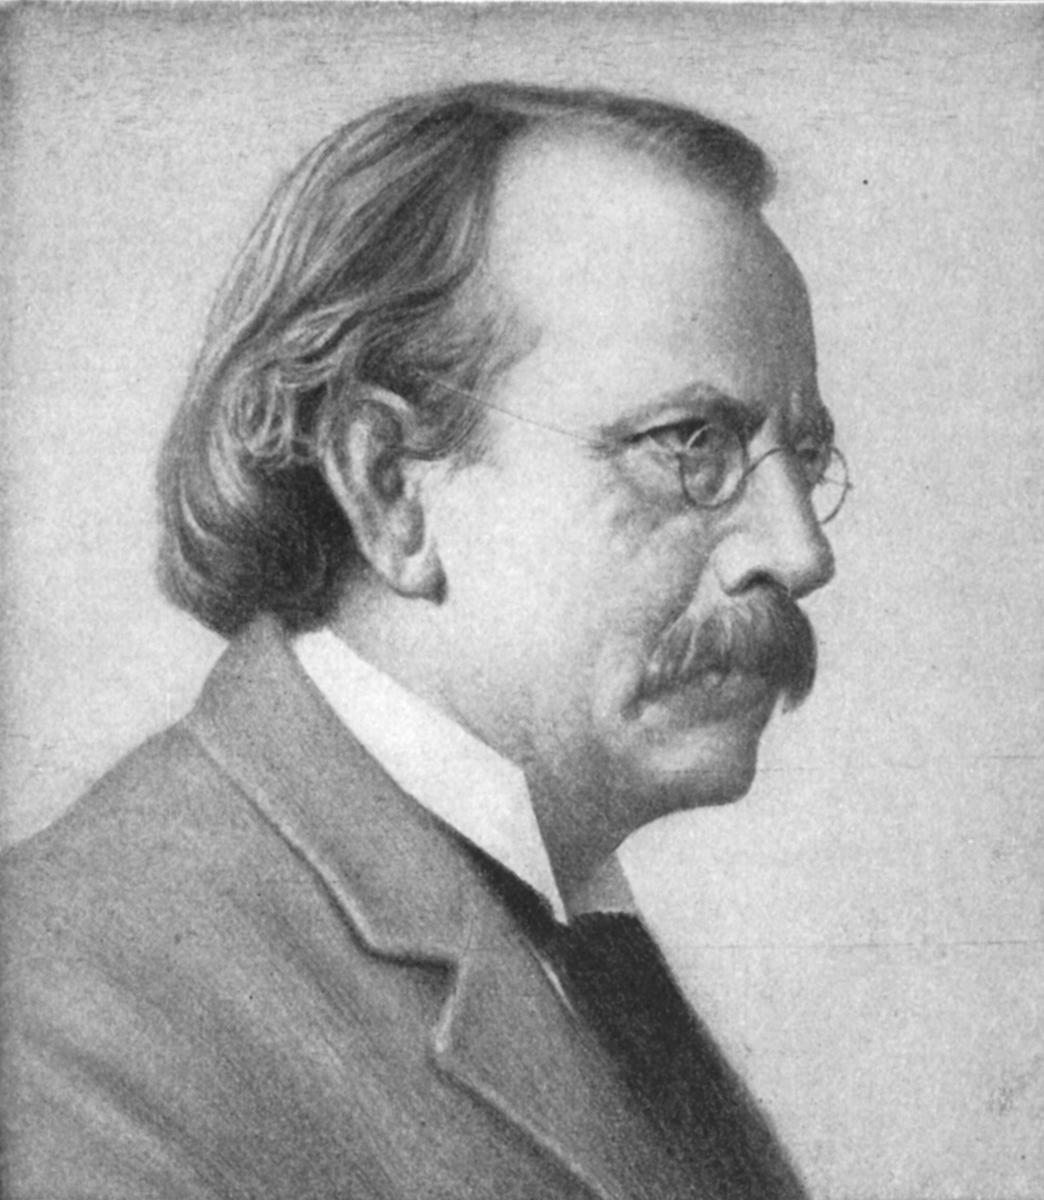 J. J. Thomson.